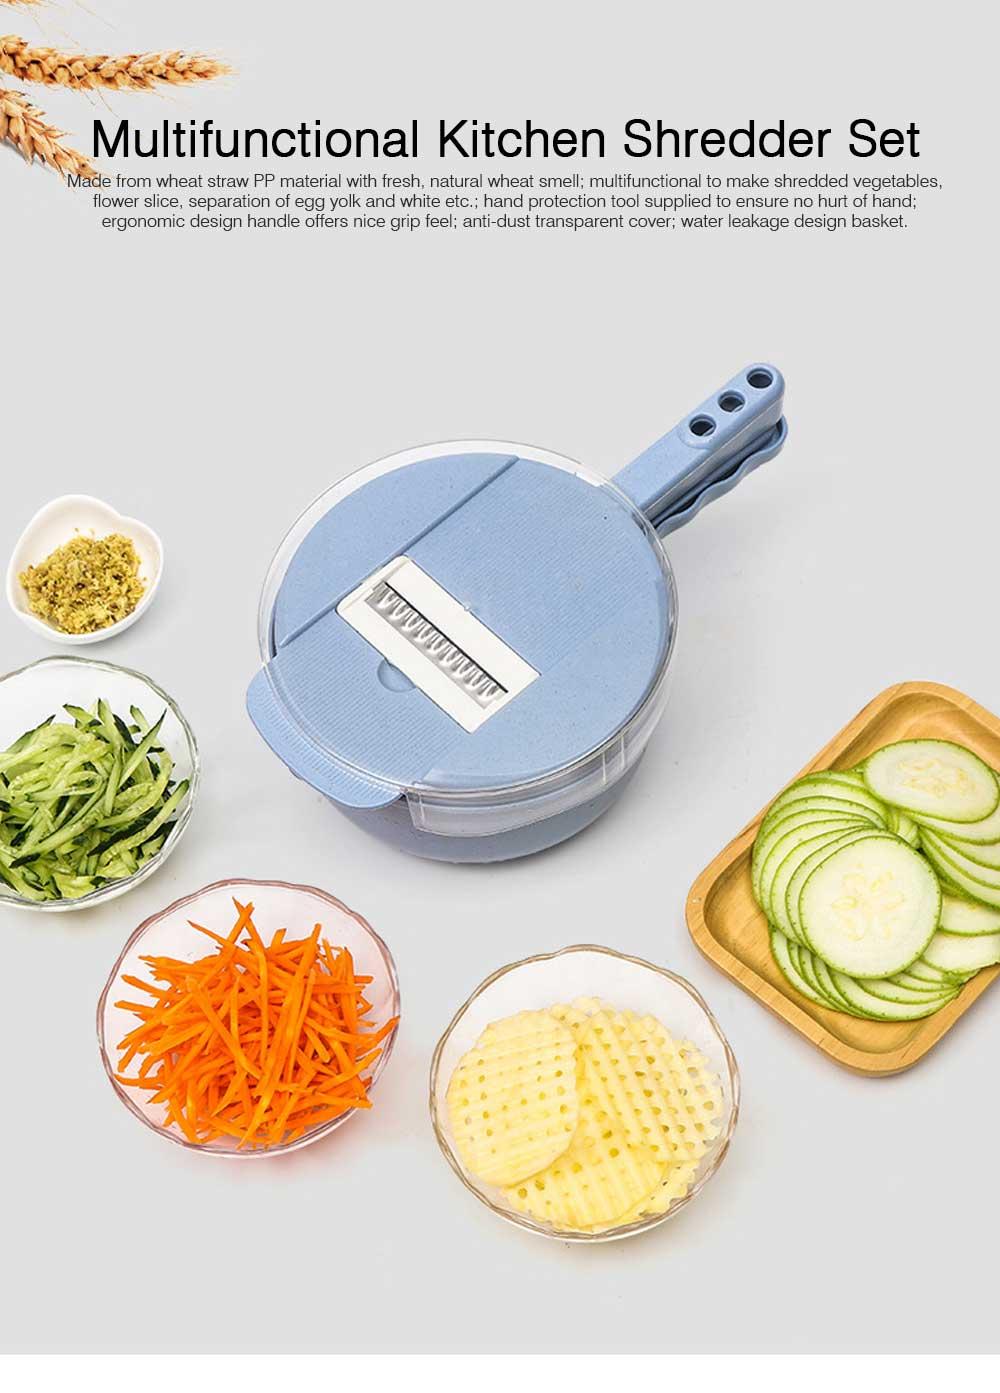 Multifunctional Kitchen Gadget Potato Scraper Set, Potato Tool Wheat-straw-made Multipurposer Kitchen Shredder Slice Scraper 0